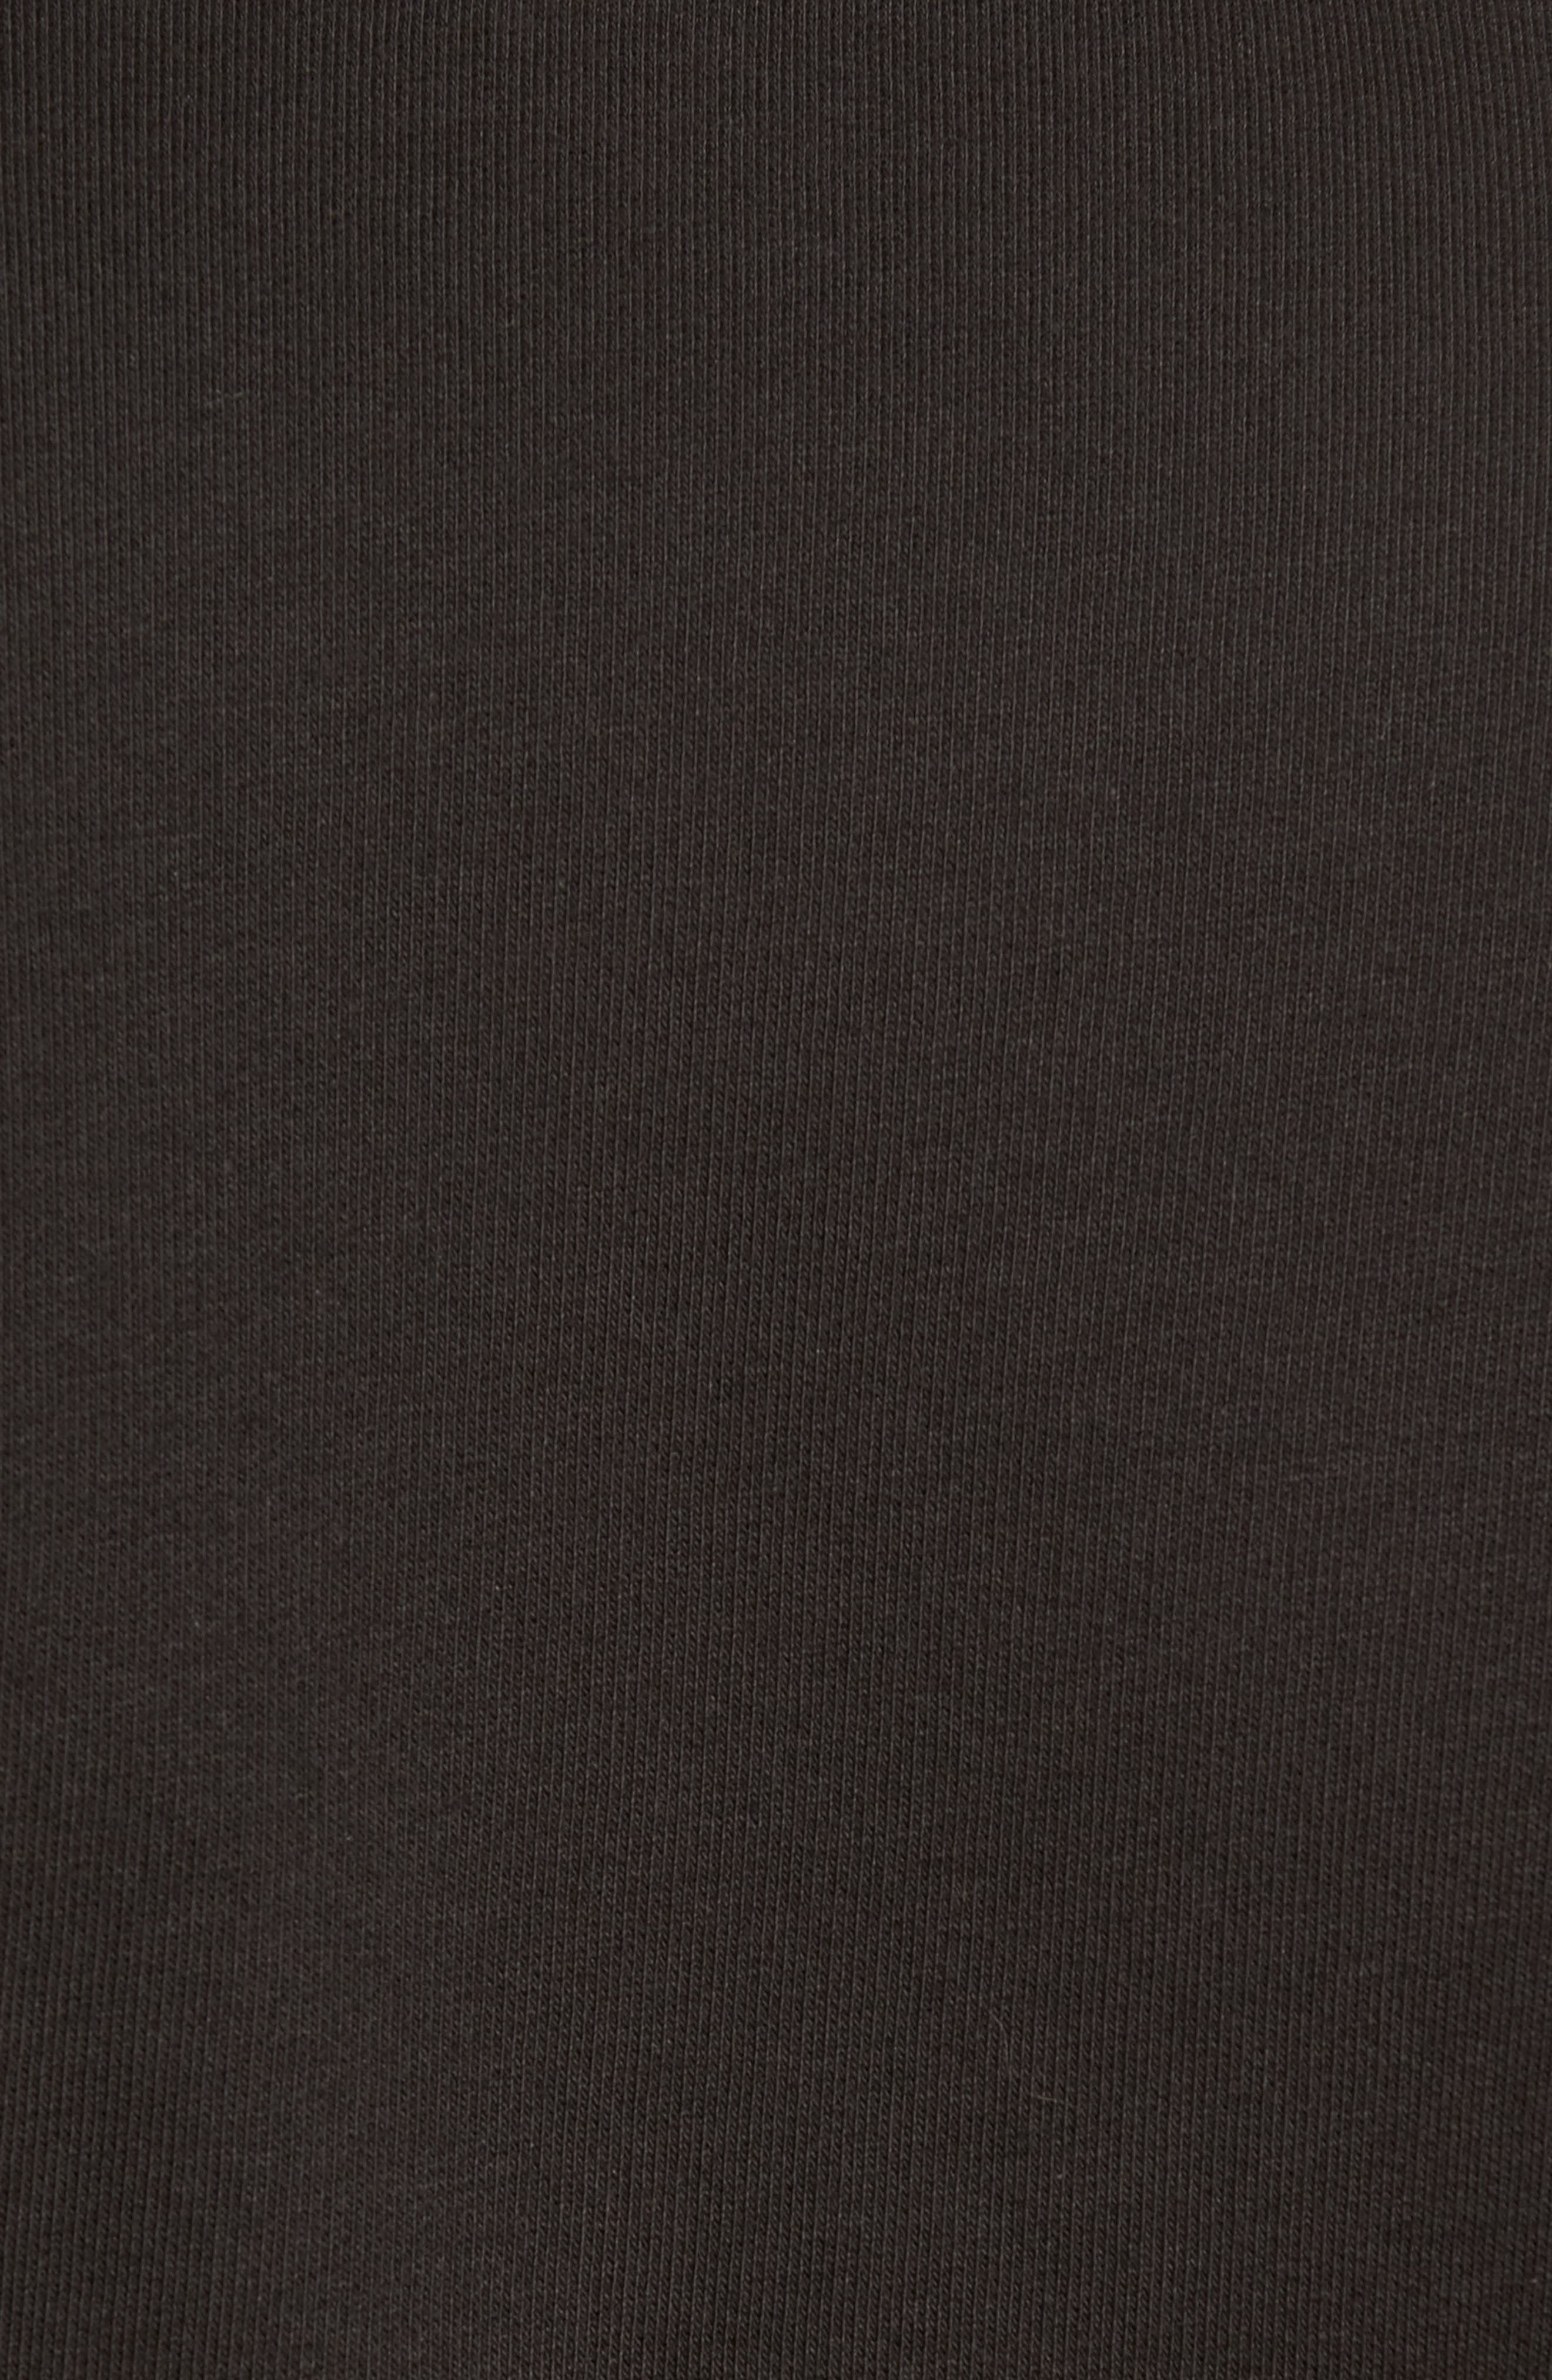 Lounge Crewneck Sweatshirt,                             Alternate thumbnail 5, color,                             002